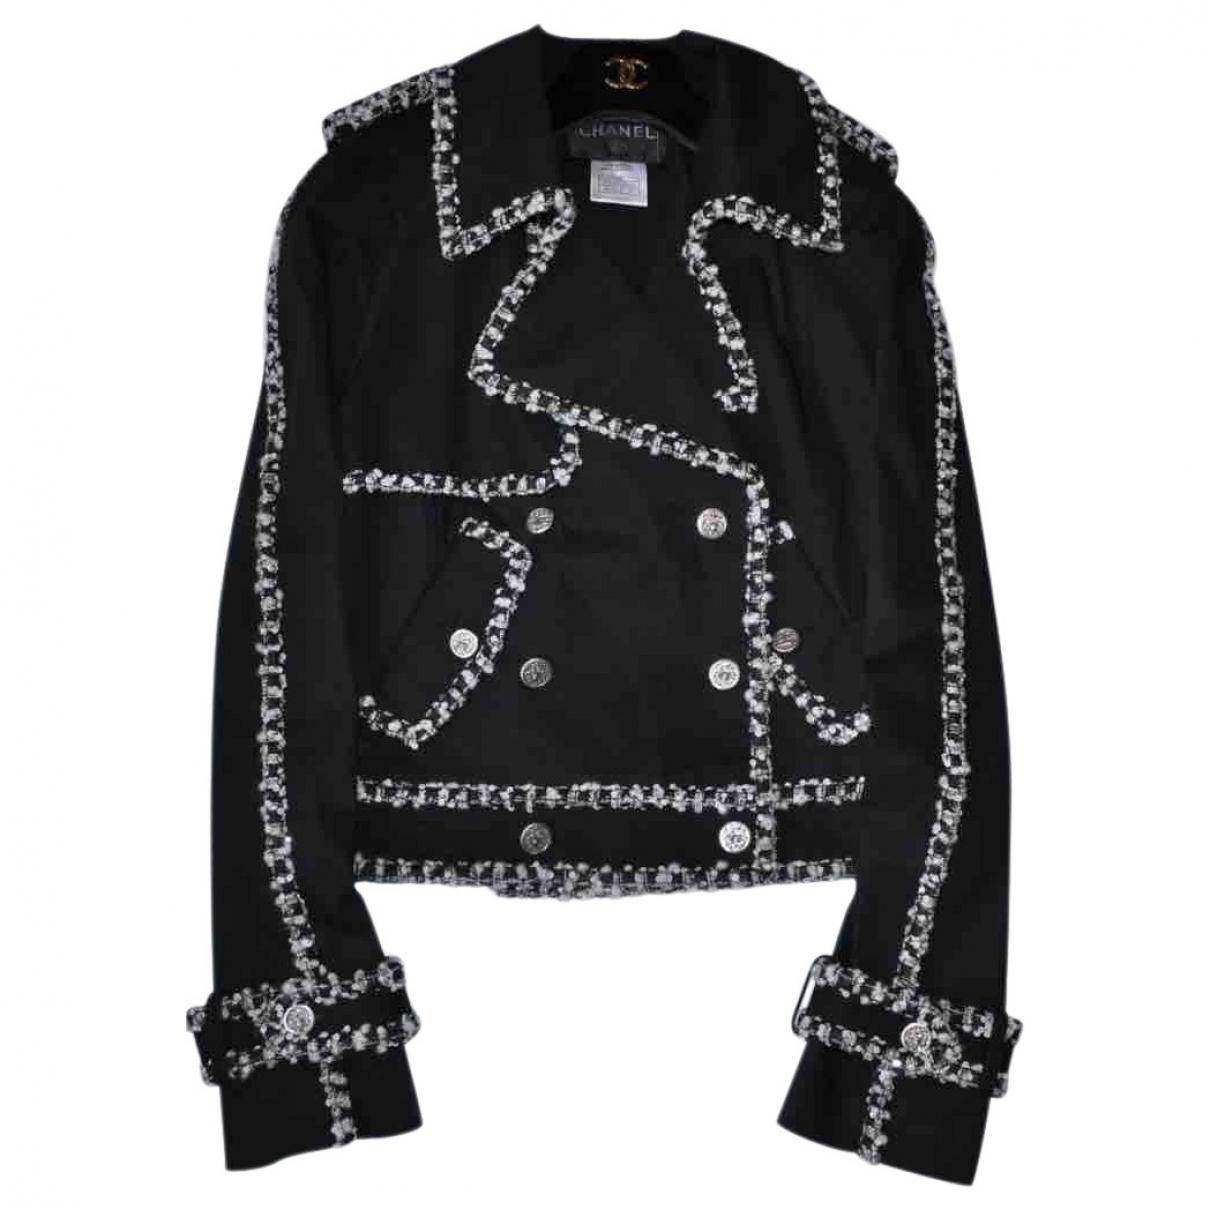 Chanel \N Black Cotton jacket for Women 38 FR